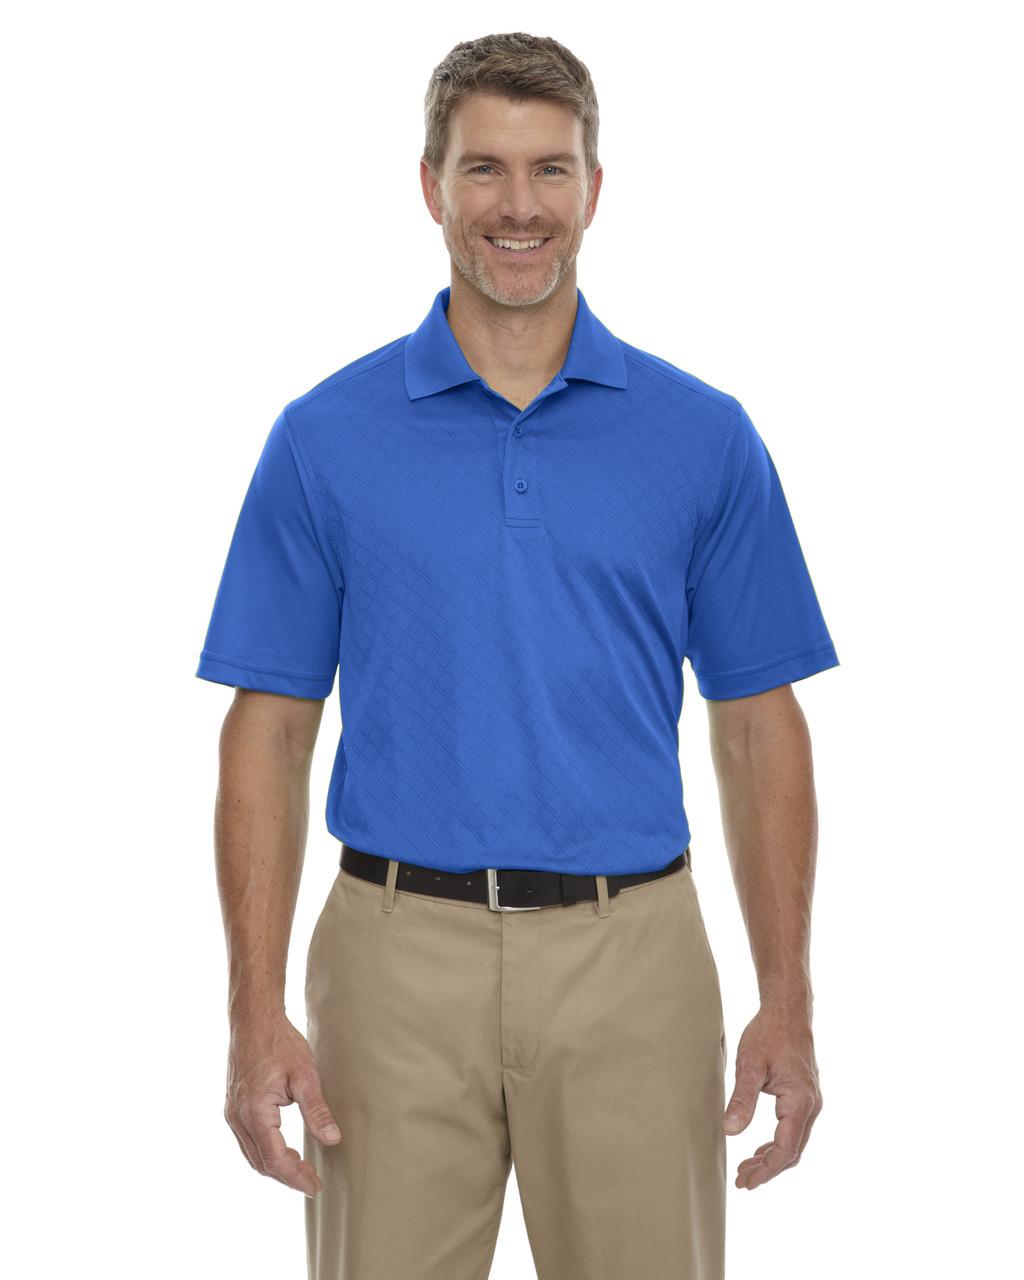 Monarch Blue Ash City Mens Mens Jacquard Pique Polo Shirt S